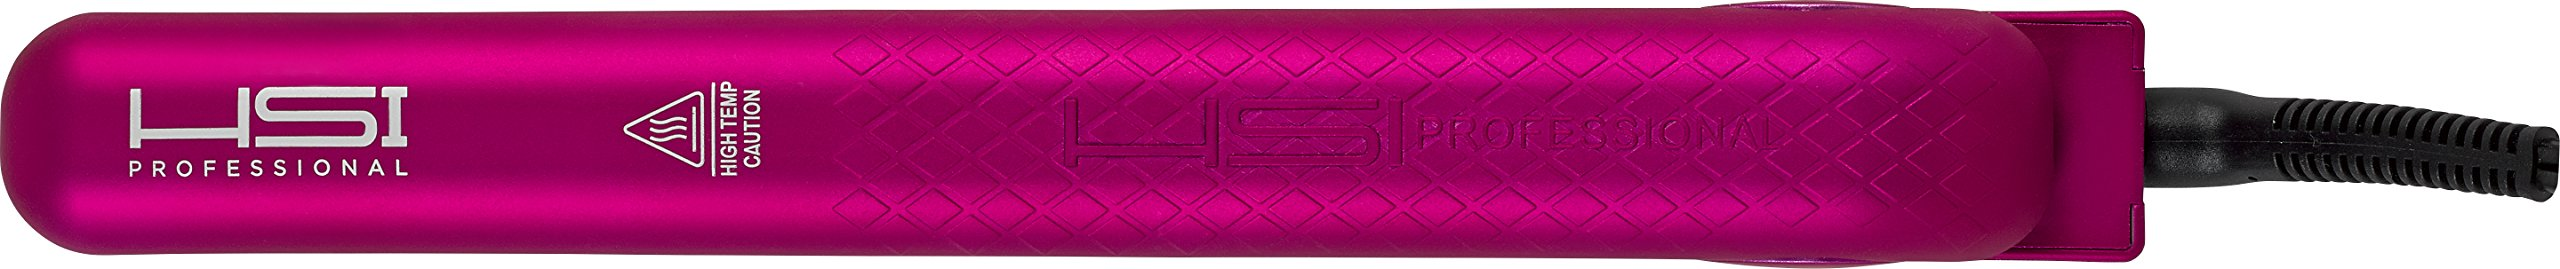 HSI Professional GliderPlus Pink Hair Straightener   Digital Ceramic Ionic Tourmaline Flat Iron   Dual Voltage 110v-220v   Glove, Pouch & Argan Oil